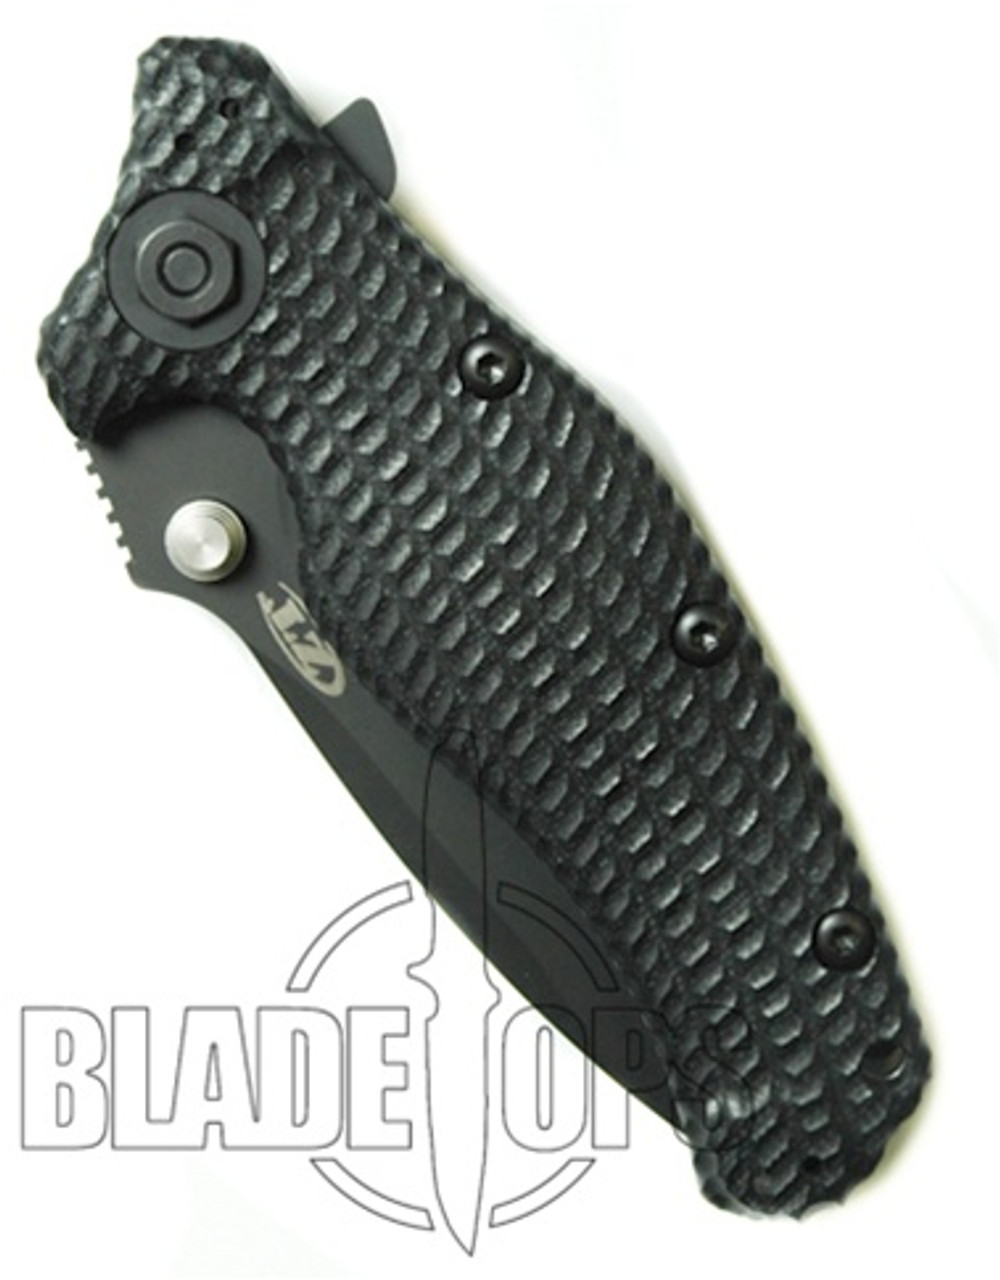 Zero Tolerance 0200ST Folder Knife, Part Serr Tactical Blade, G10 Handles